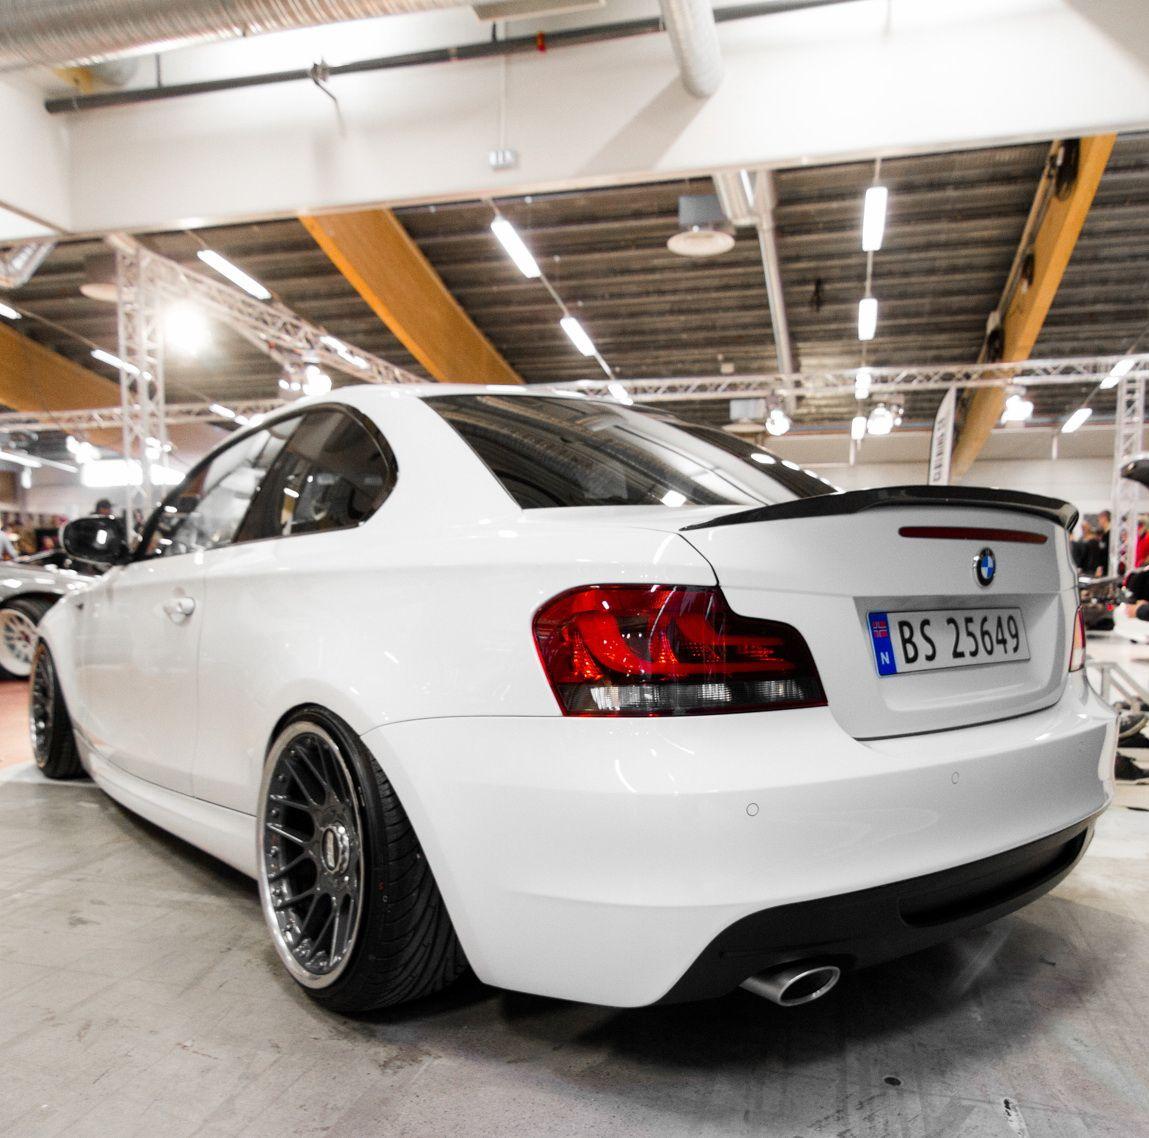 Bmwcars: Bmw Cars, BMW, BMW Series